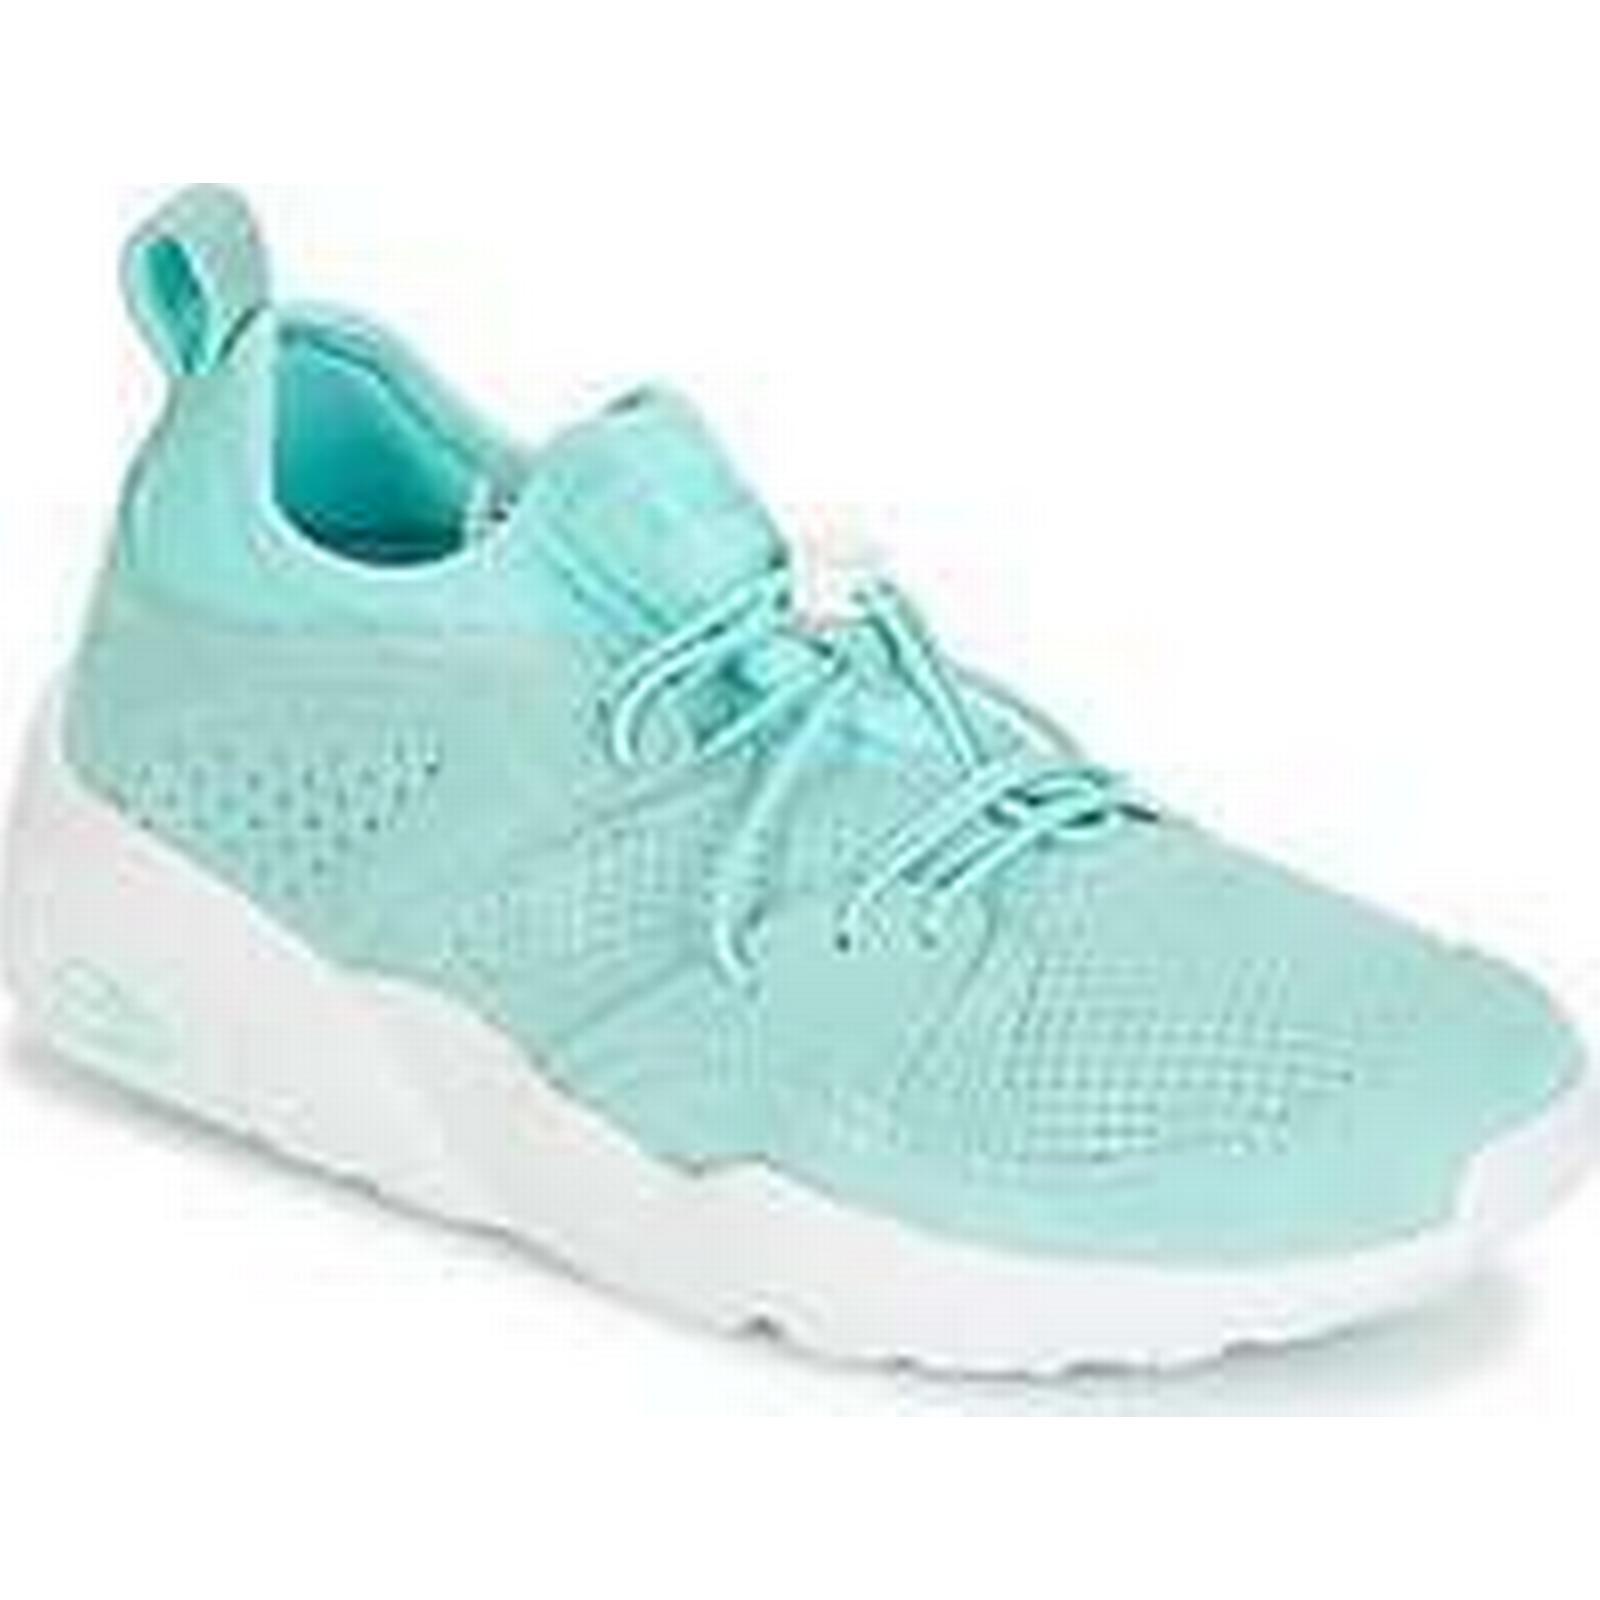 Spartoo.co.uk Puma Shoes BLAZE OF GLORY SOFT WNS women's Shoes Puma (Trainers) in Blue badd18